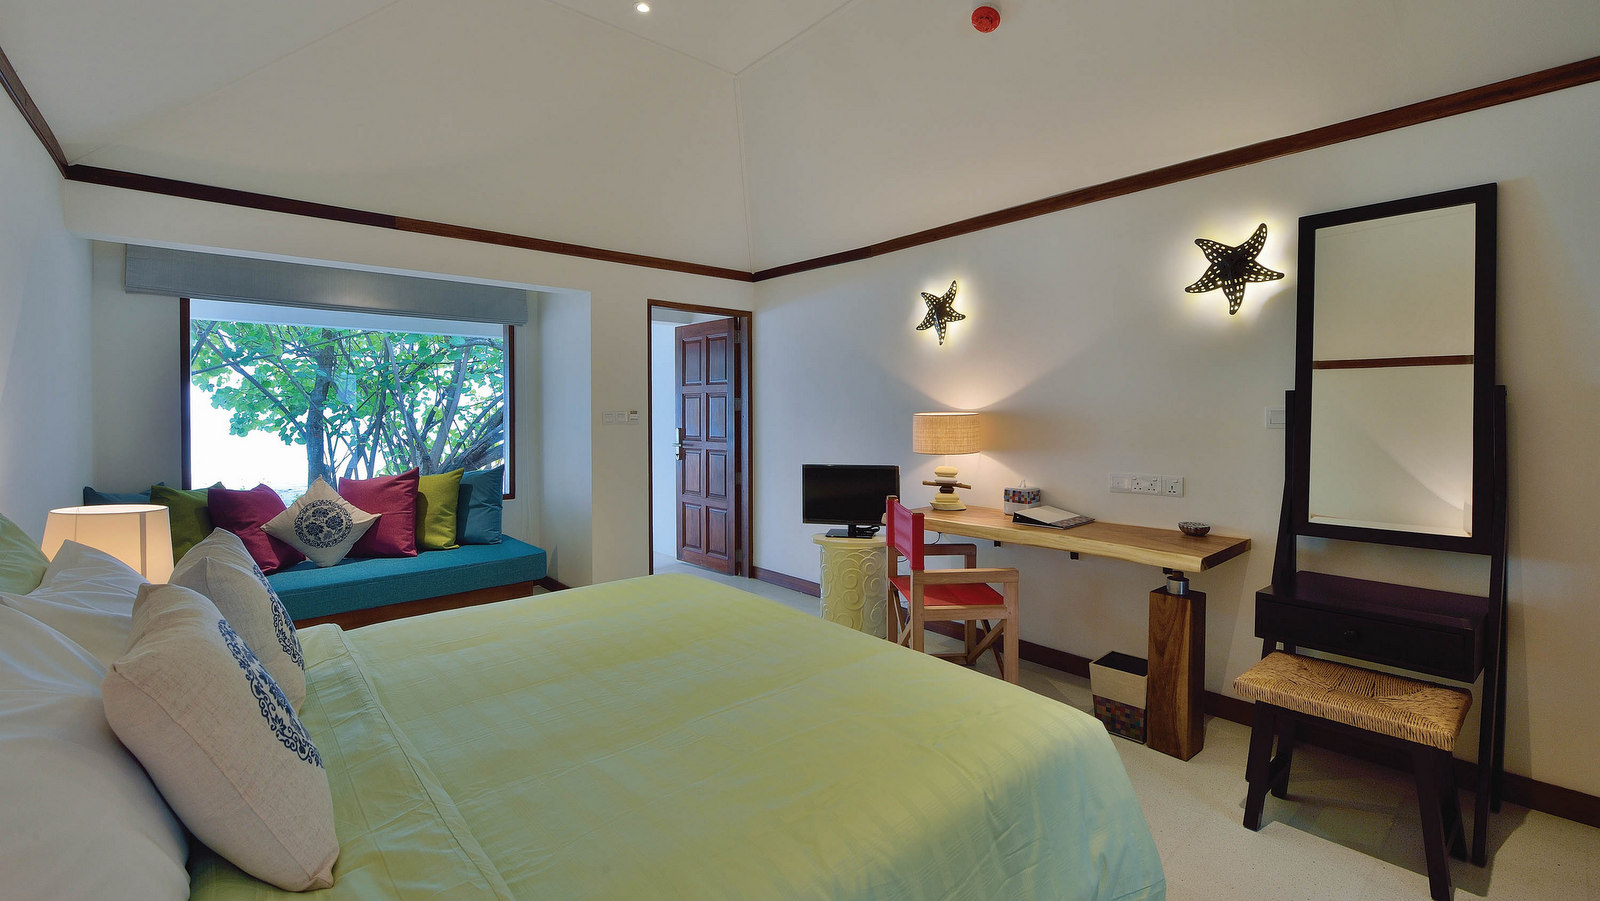 Мальдивы, отель OBLU by Atmosphere at Helengeli, номер Beach Villa